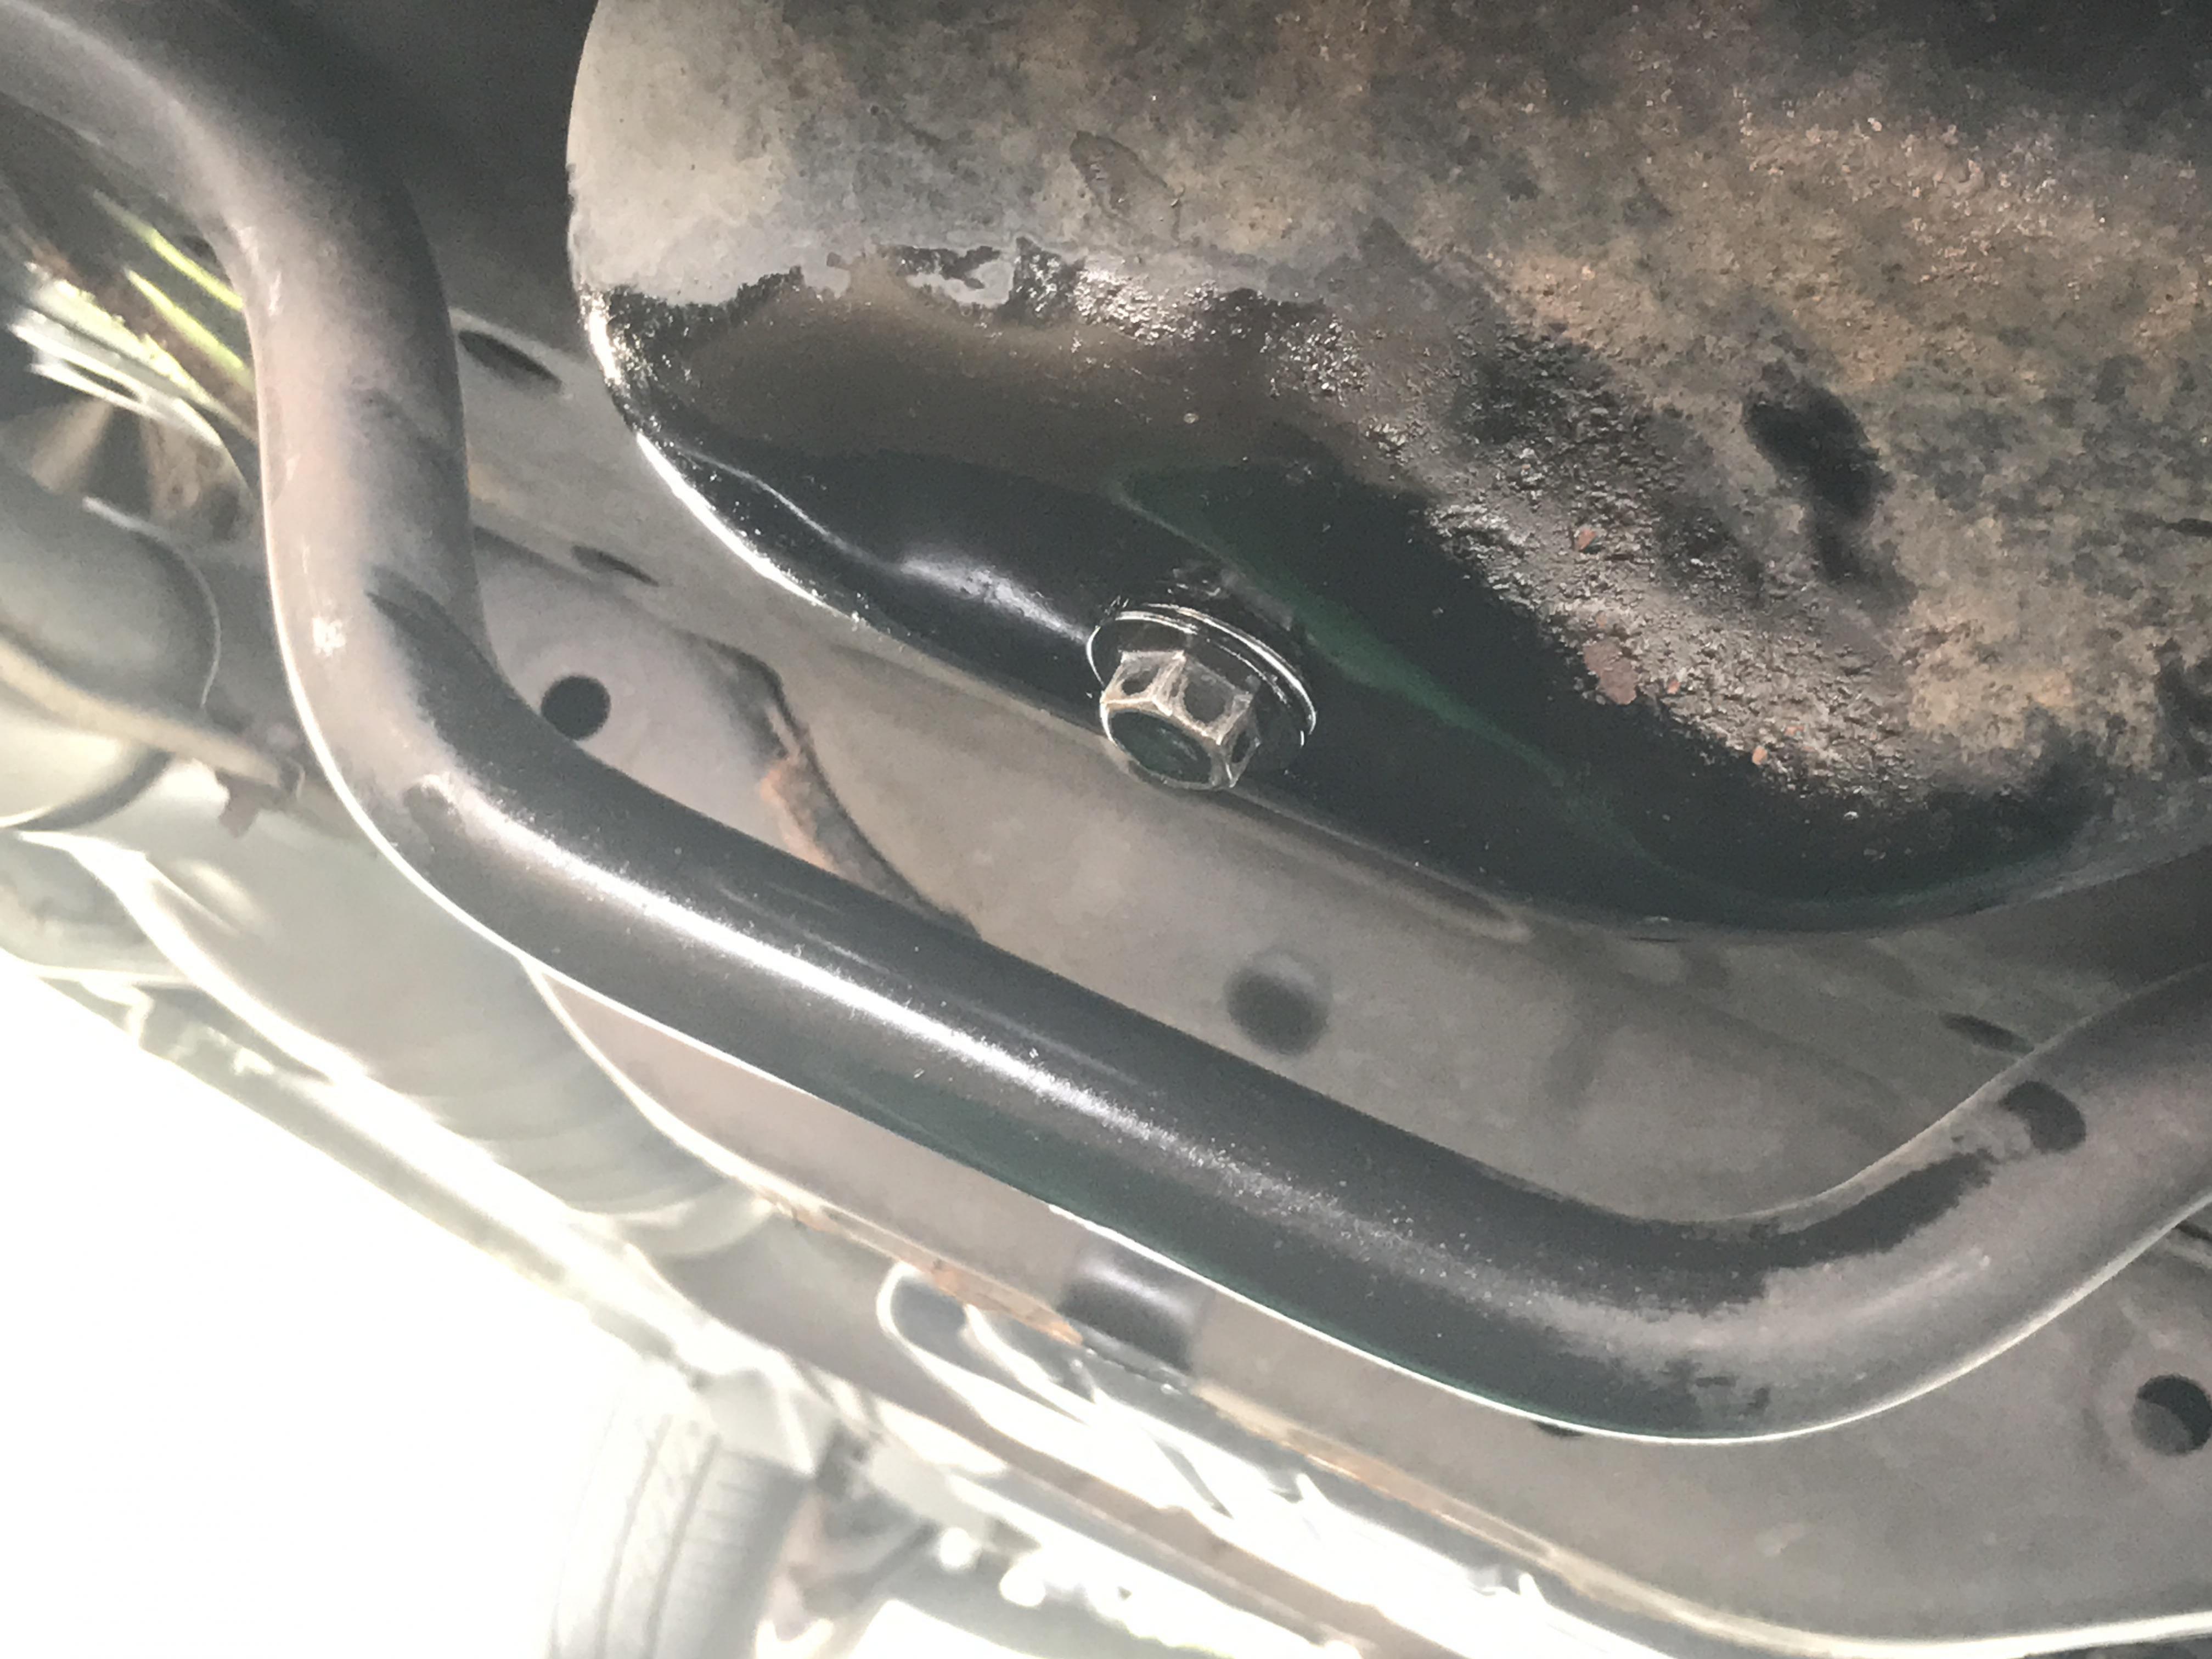 Oil change help? (Crush washer) - Subaru Outback - Subaru Outback Forums